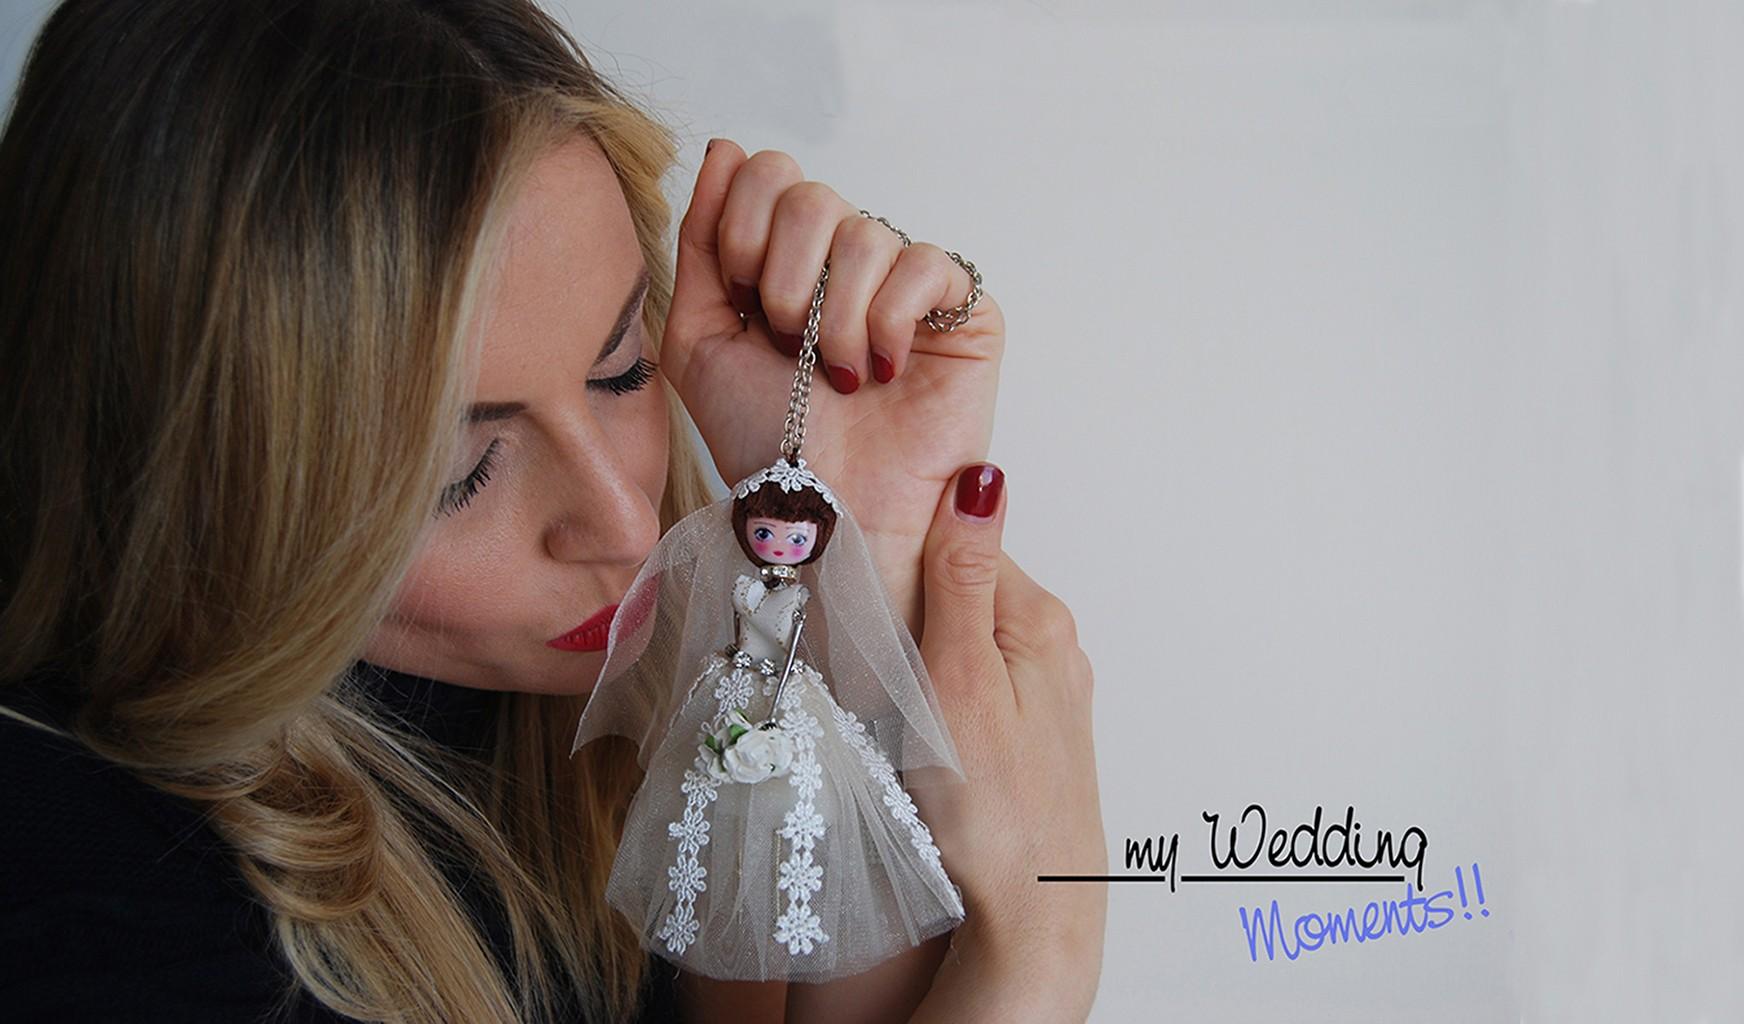 Le Briciole , my favorite dolls !!